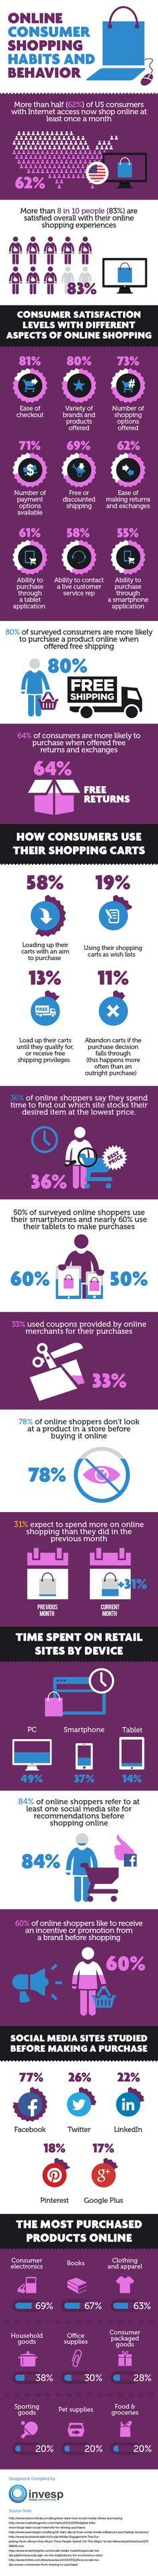 Online Consumer Shopping Habits and Behavior image online consumer shopping habbits2